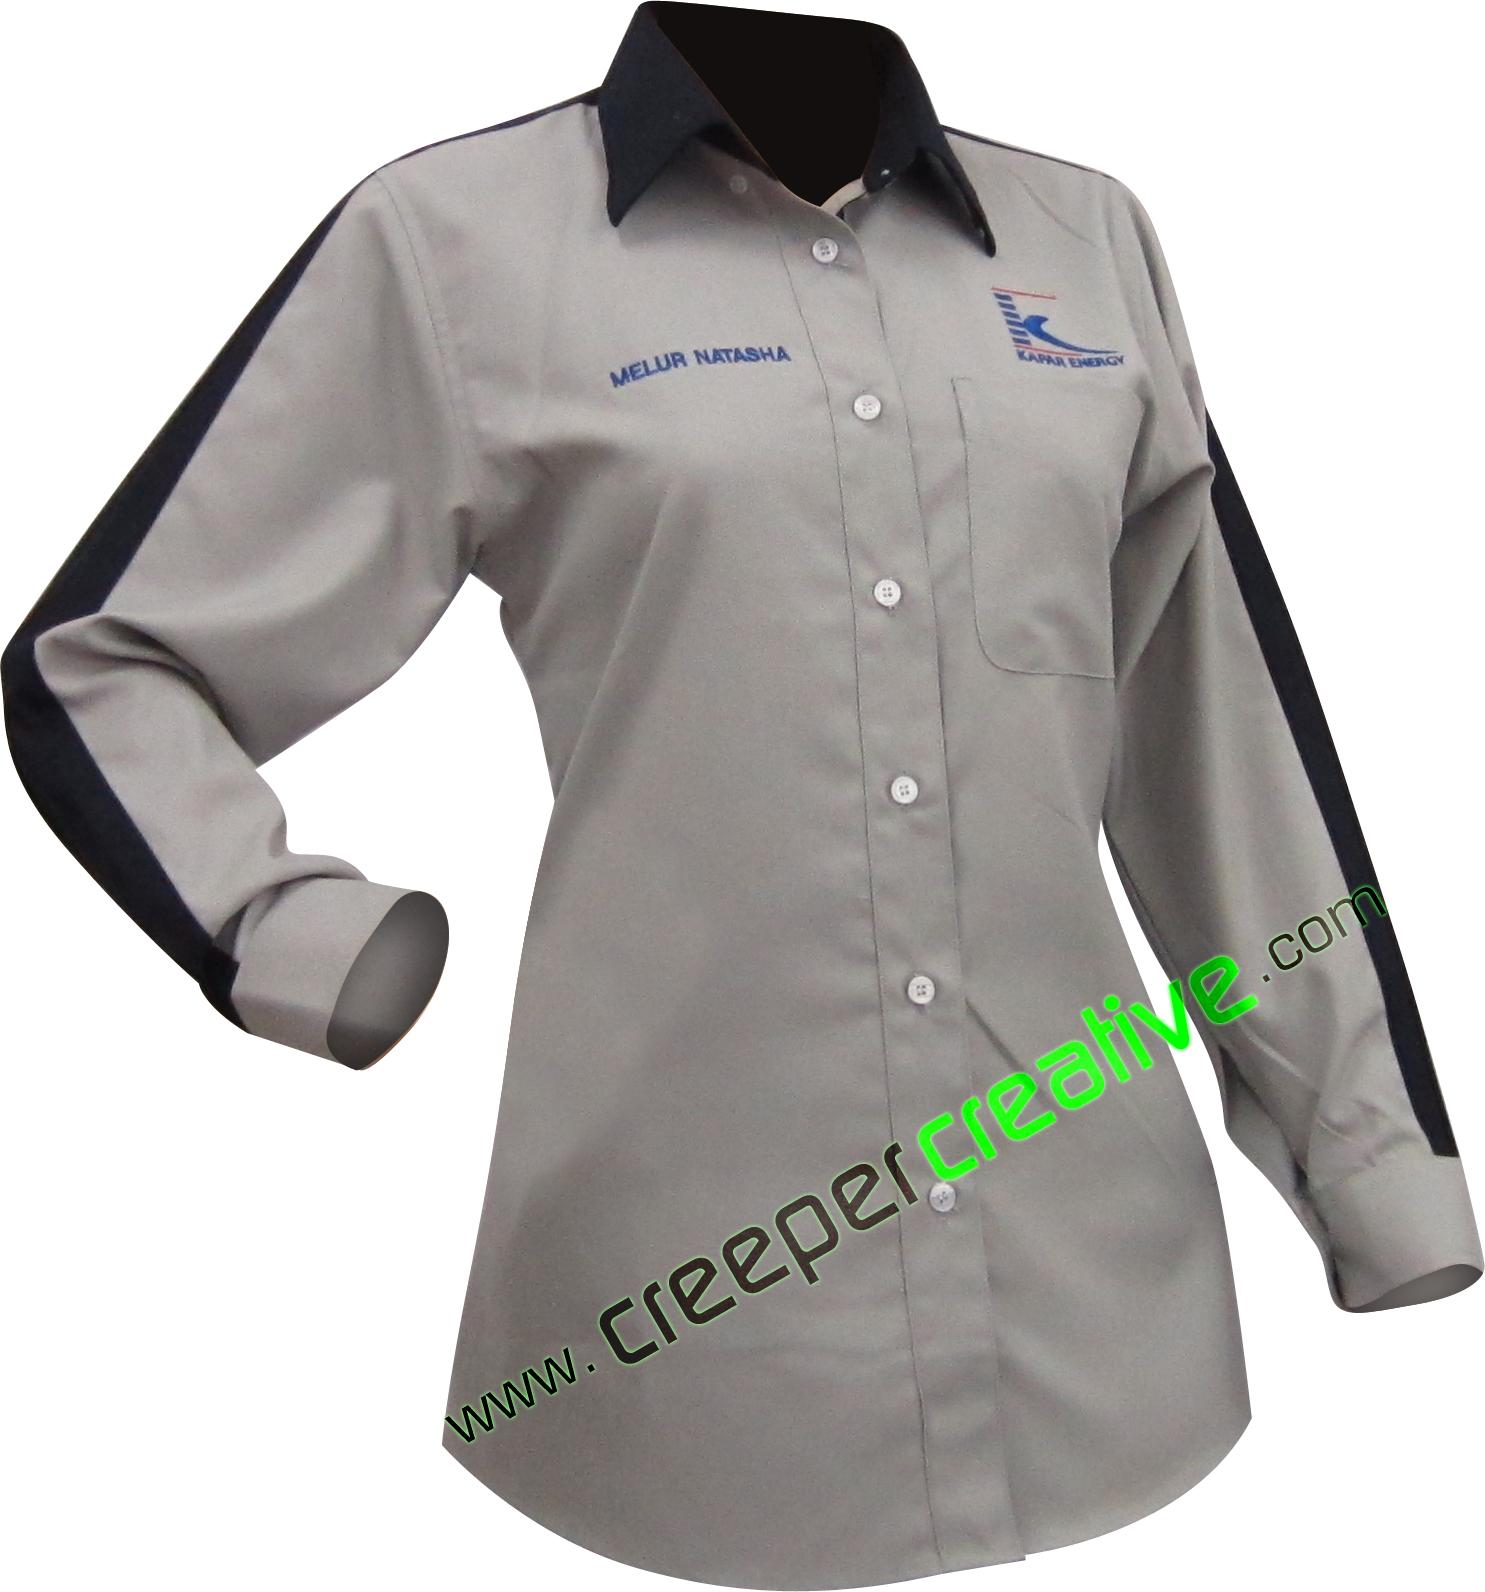 Corporate Shirt - Kapar Energy Venture | F1 Shirt